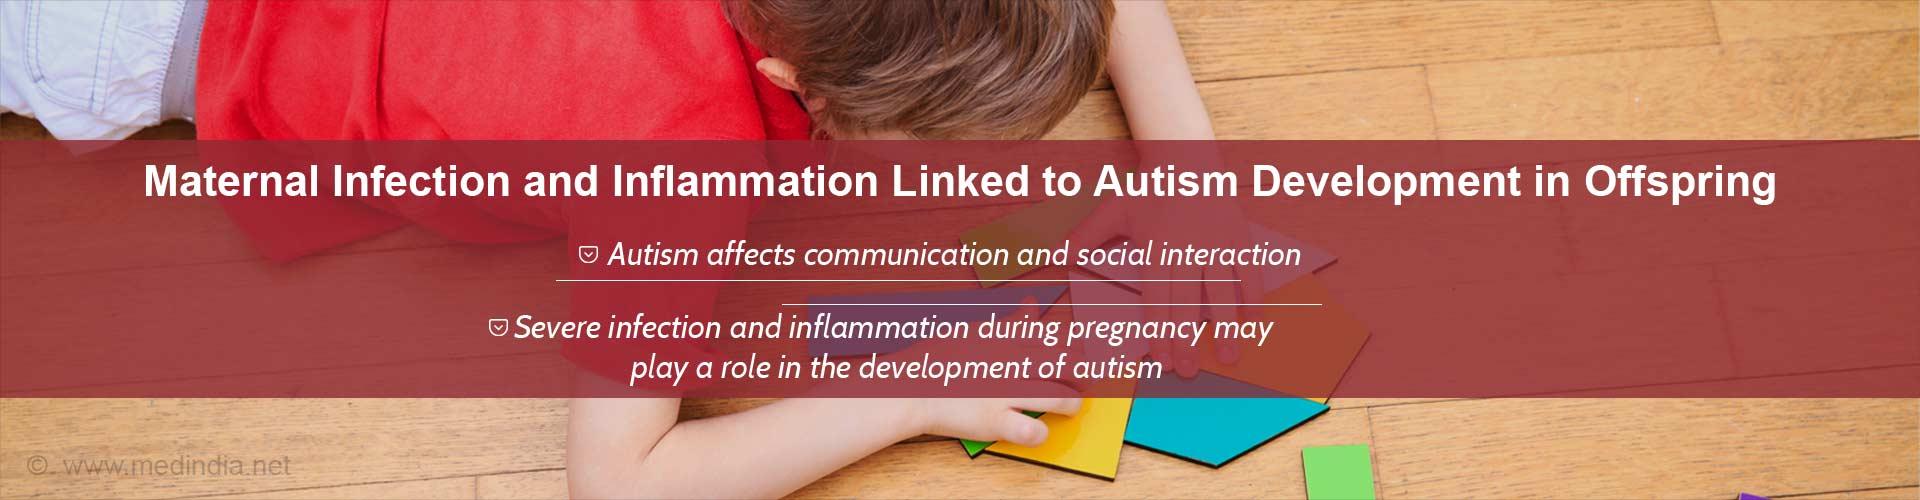 Possible Mechanisms of Autism Development Explored